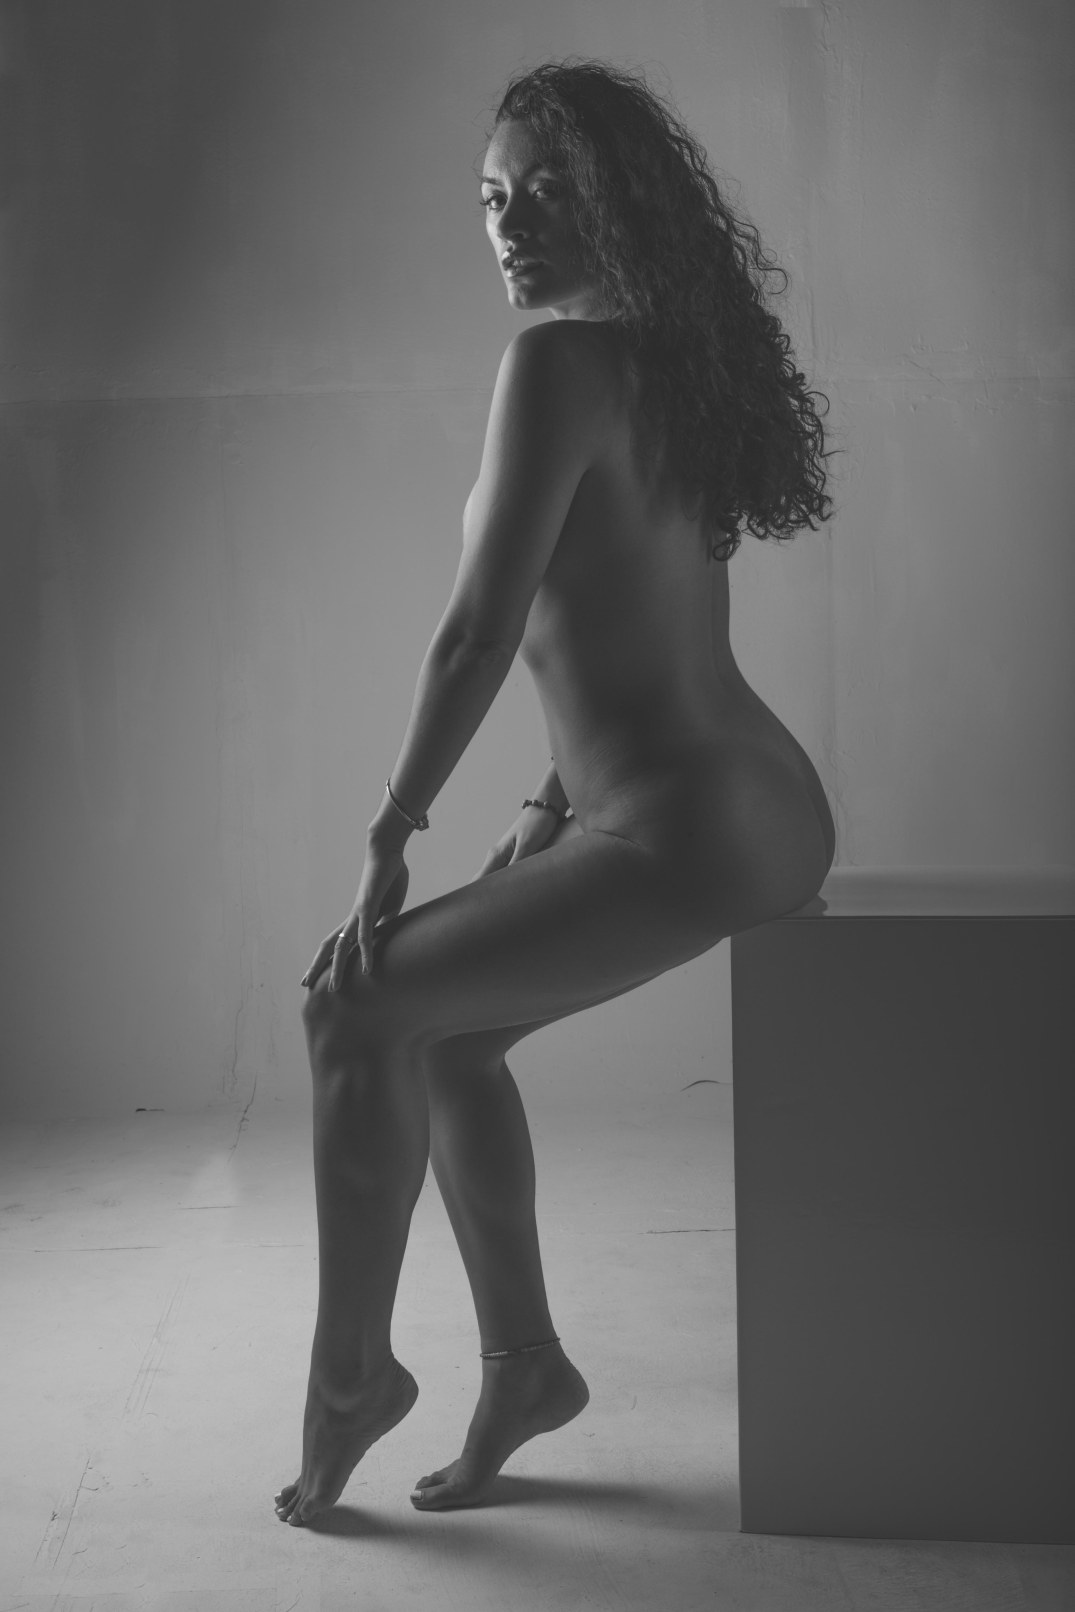 boudior nude photography HK by paulstylist-39